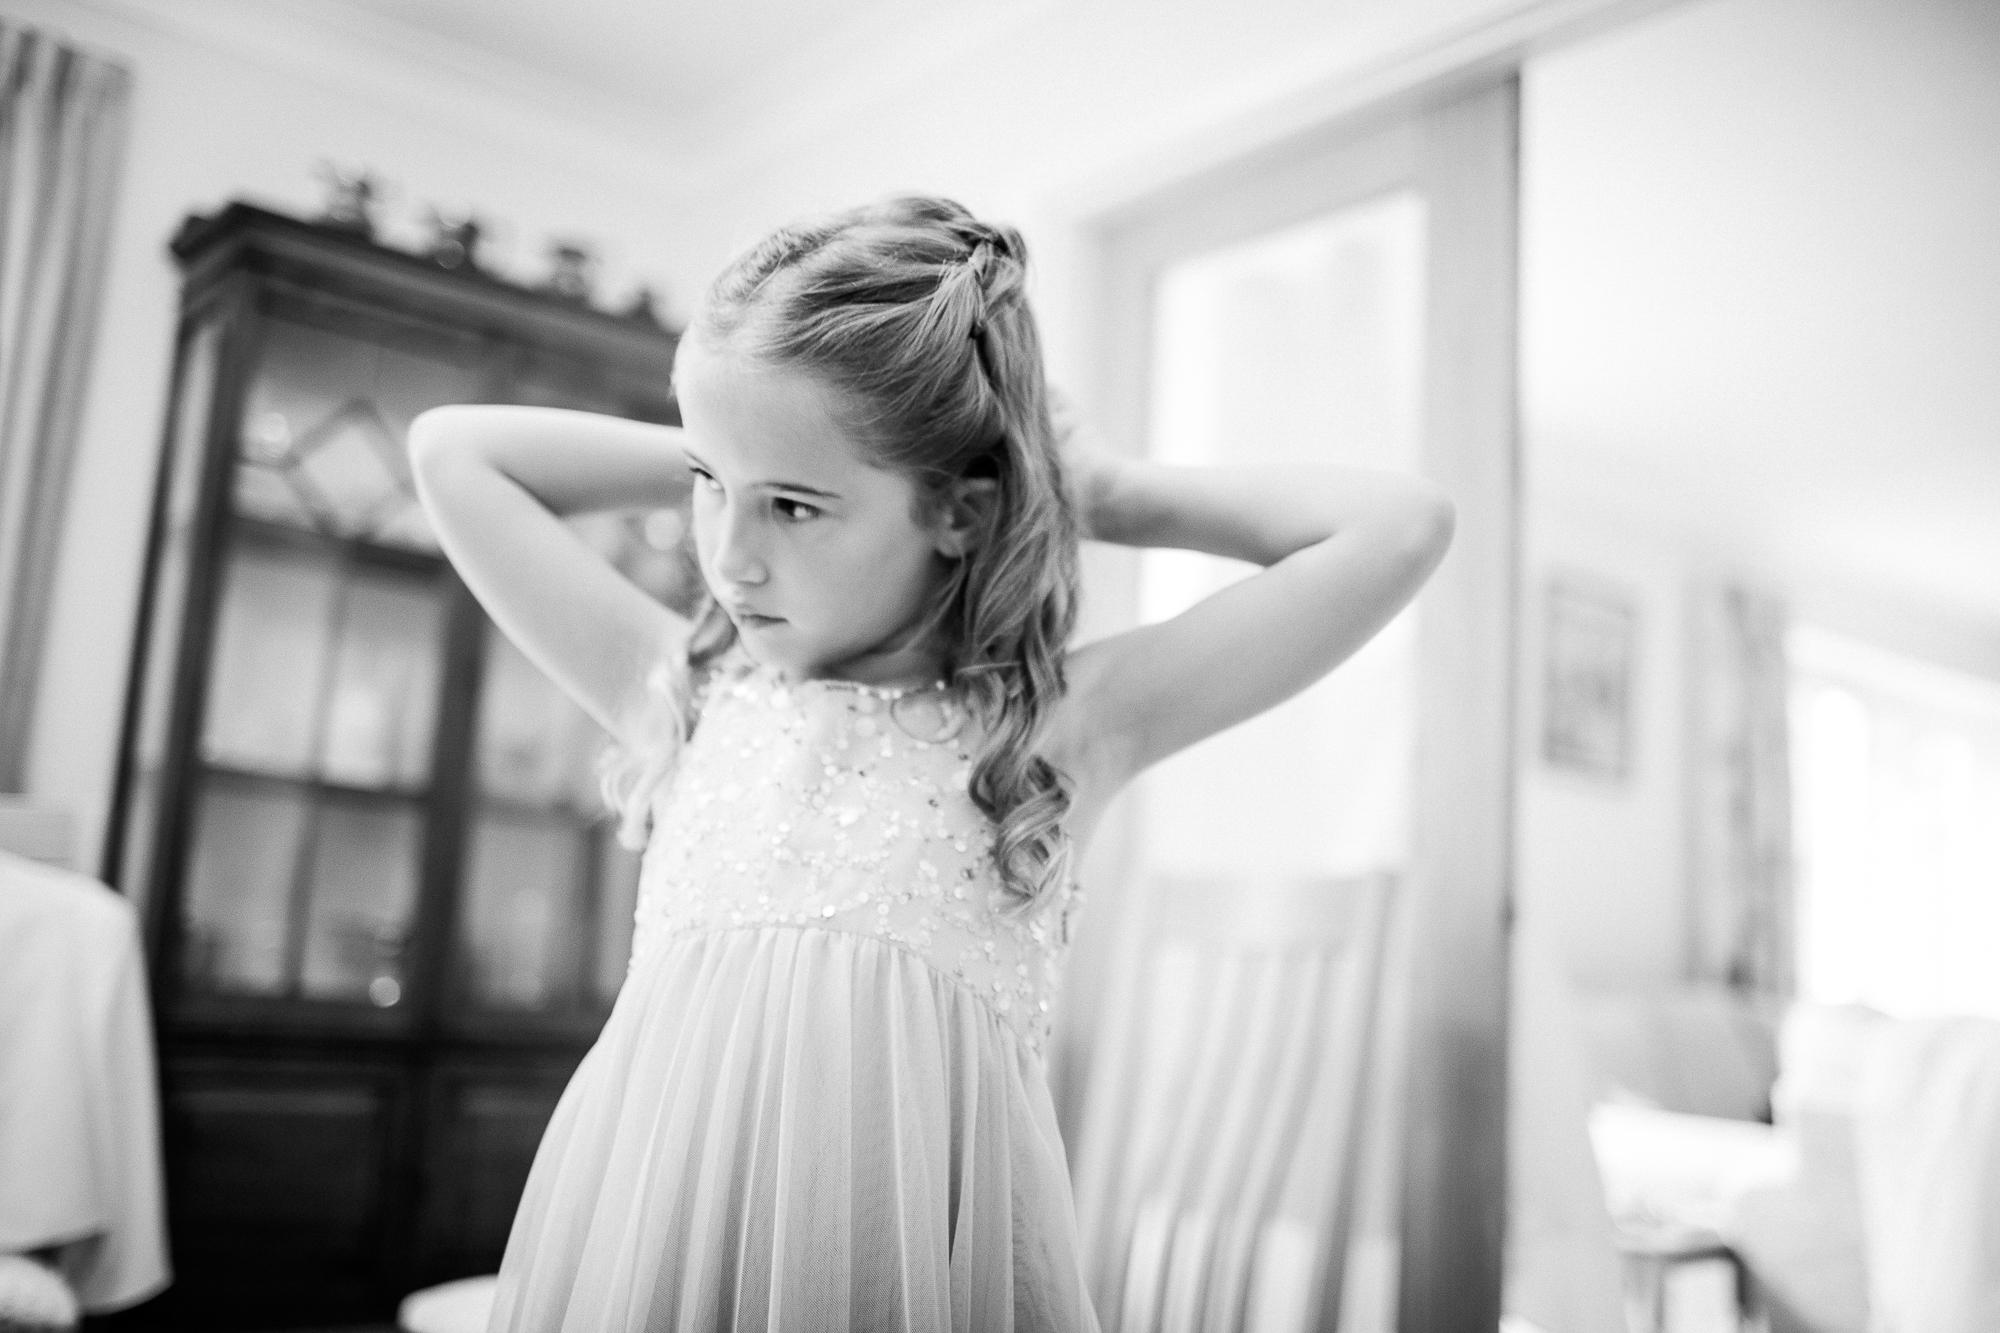 Little Flower Girl Being Maddies Dad The Boichat Files